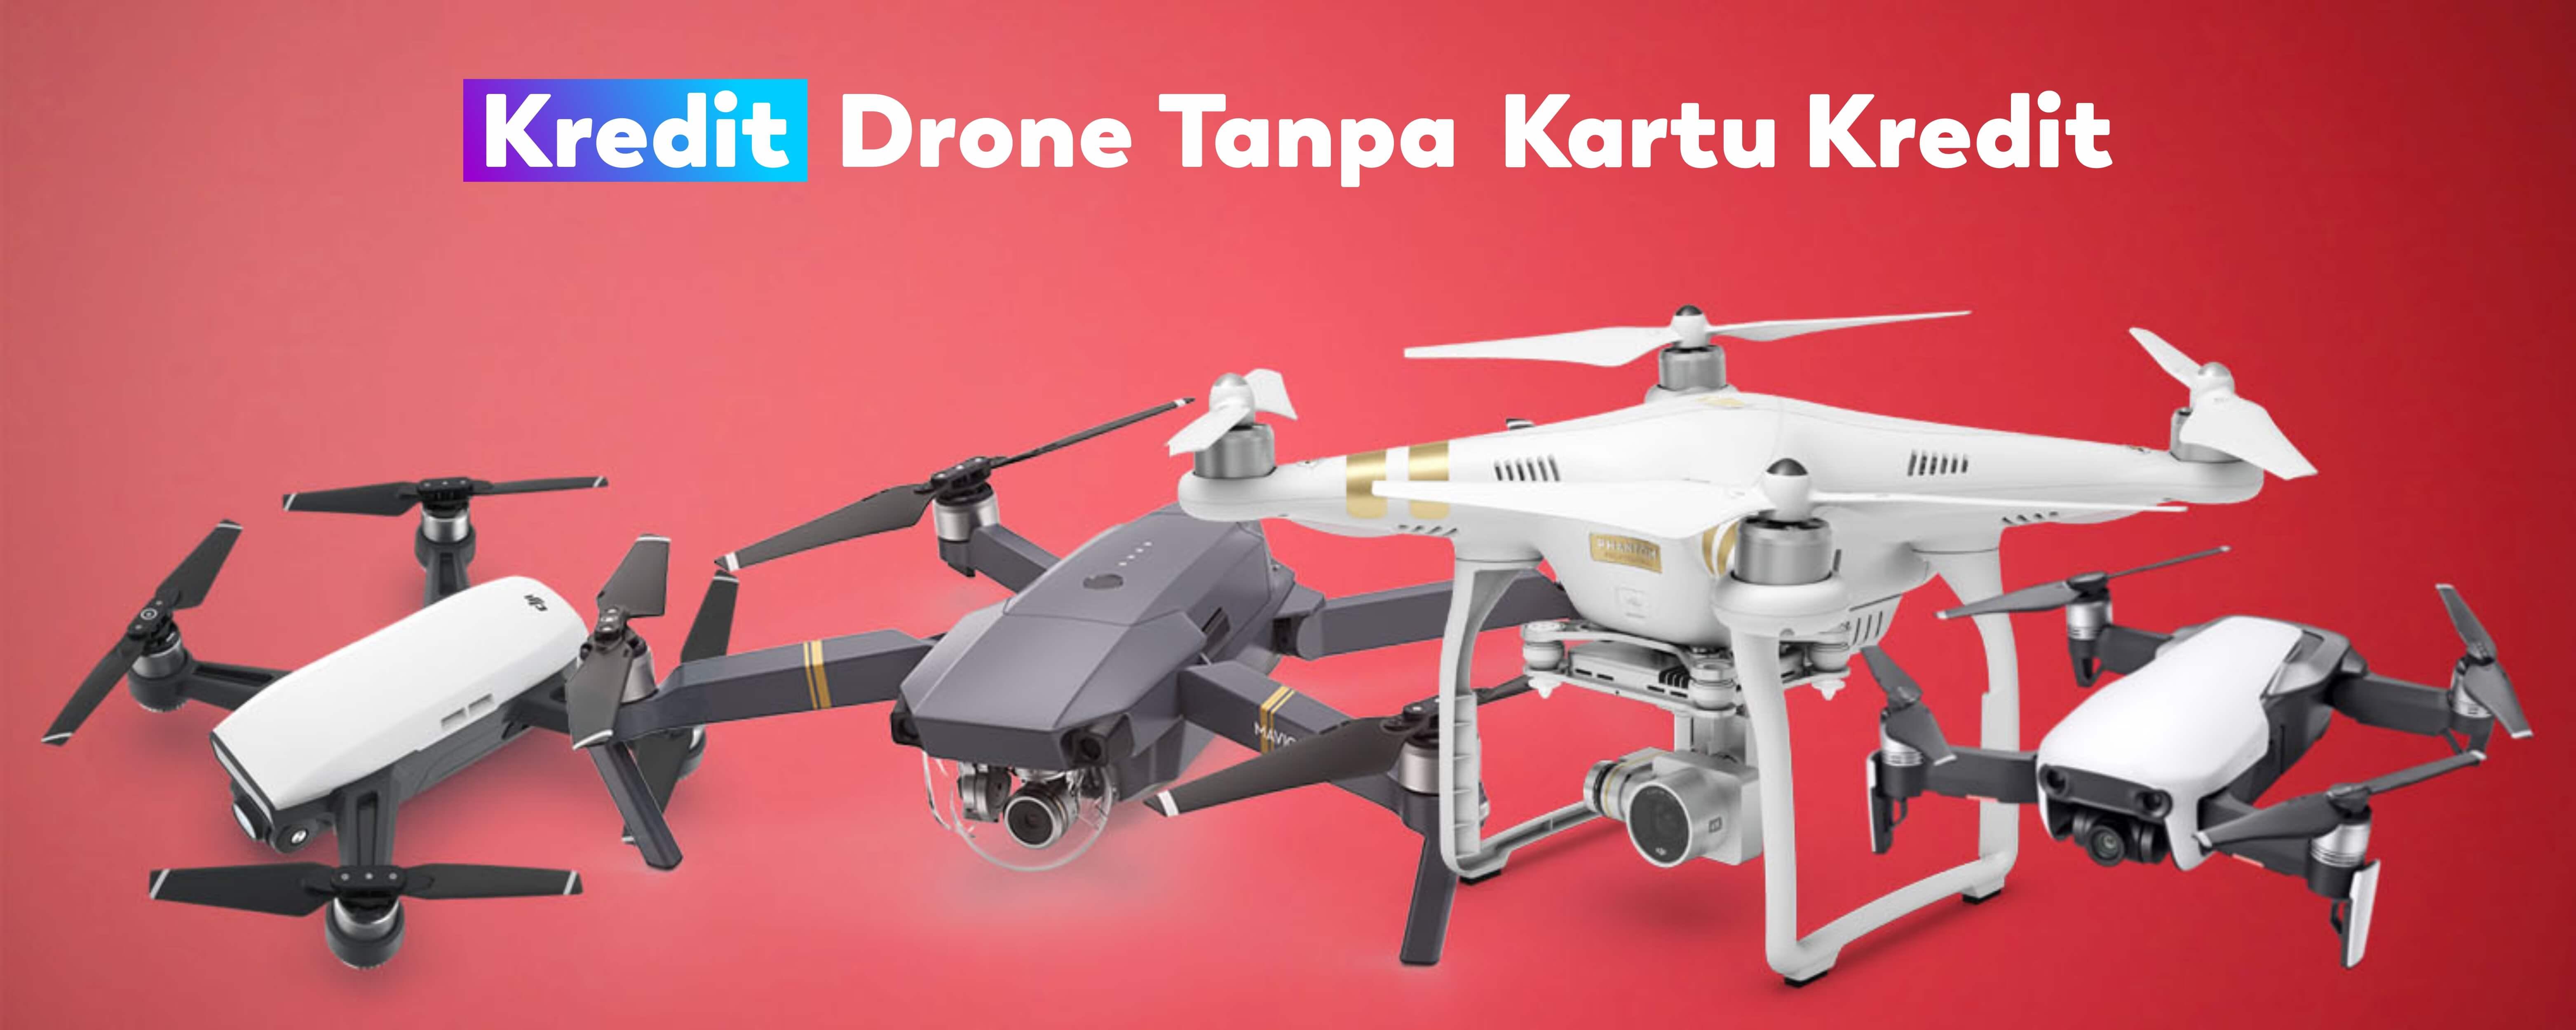 Kredit Drone Tanpa Kartu Kredit